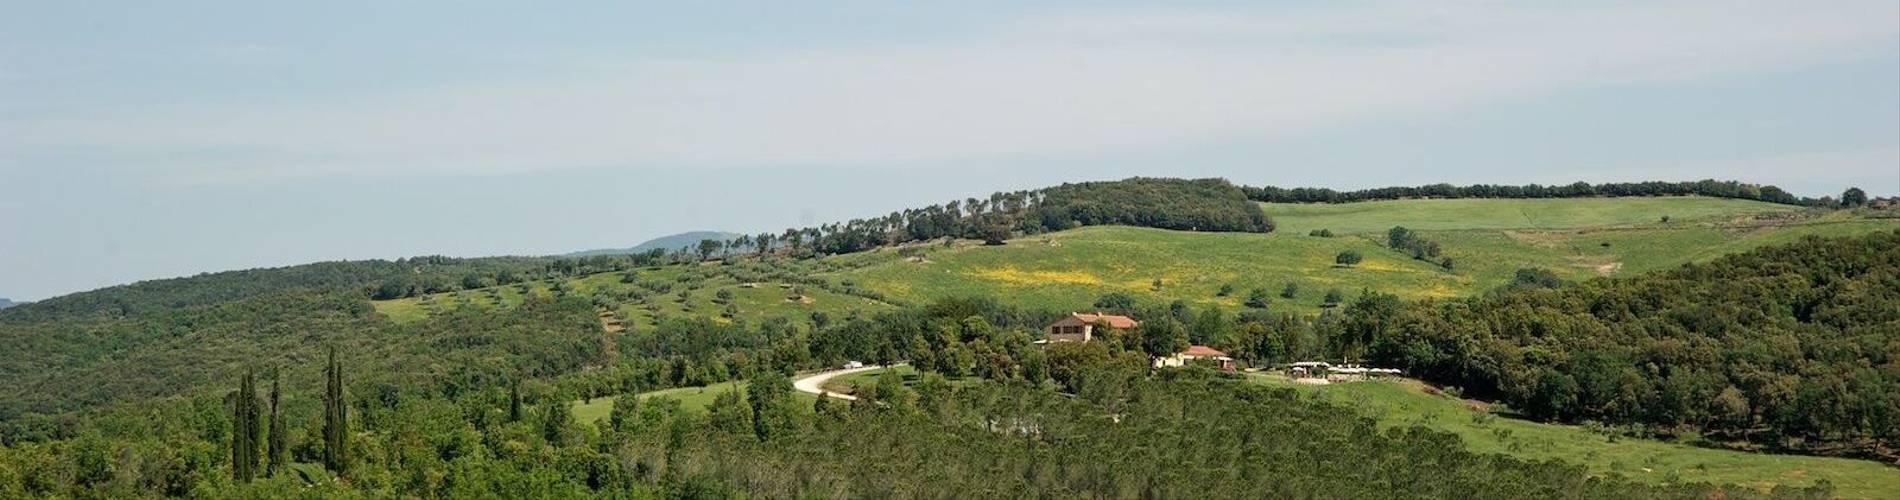 External area around Tenuta Casteani.jpg